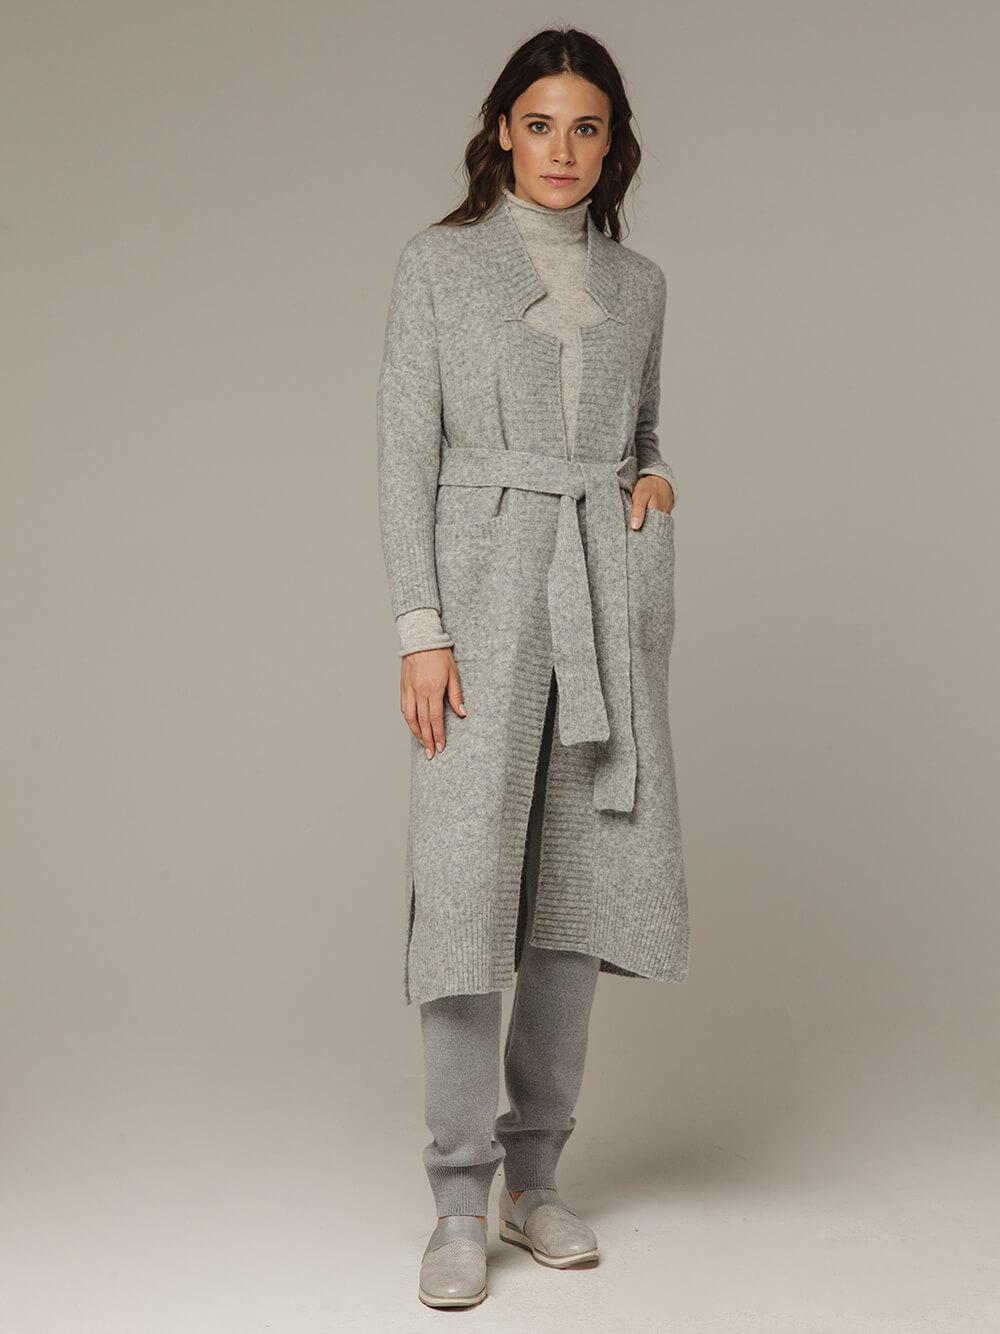 Женский серый кардиган на поясе с карманами - фото 1